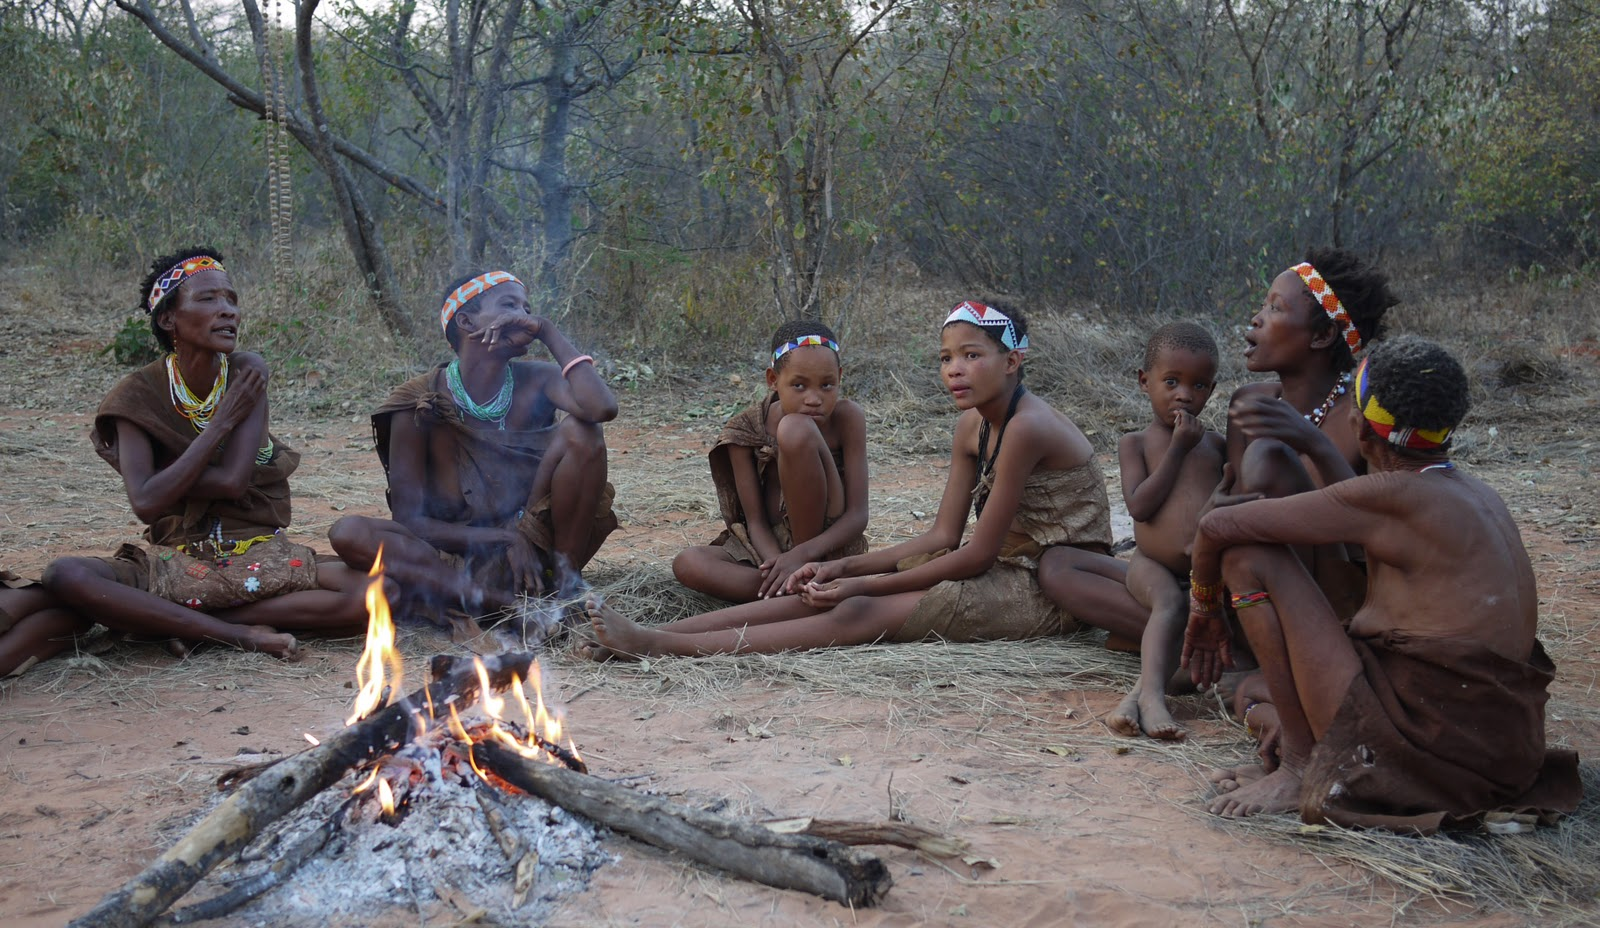 Porn amazonic tribe nude vista nackt video